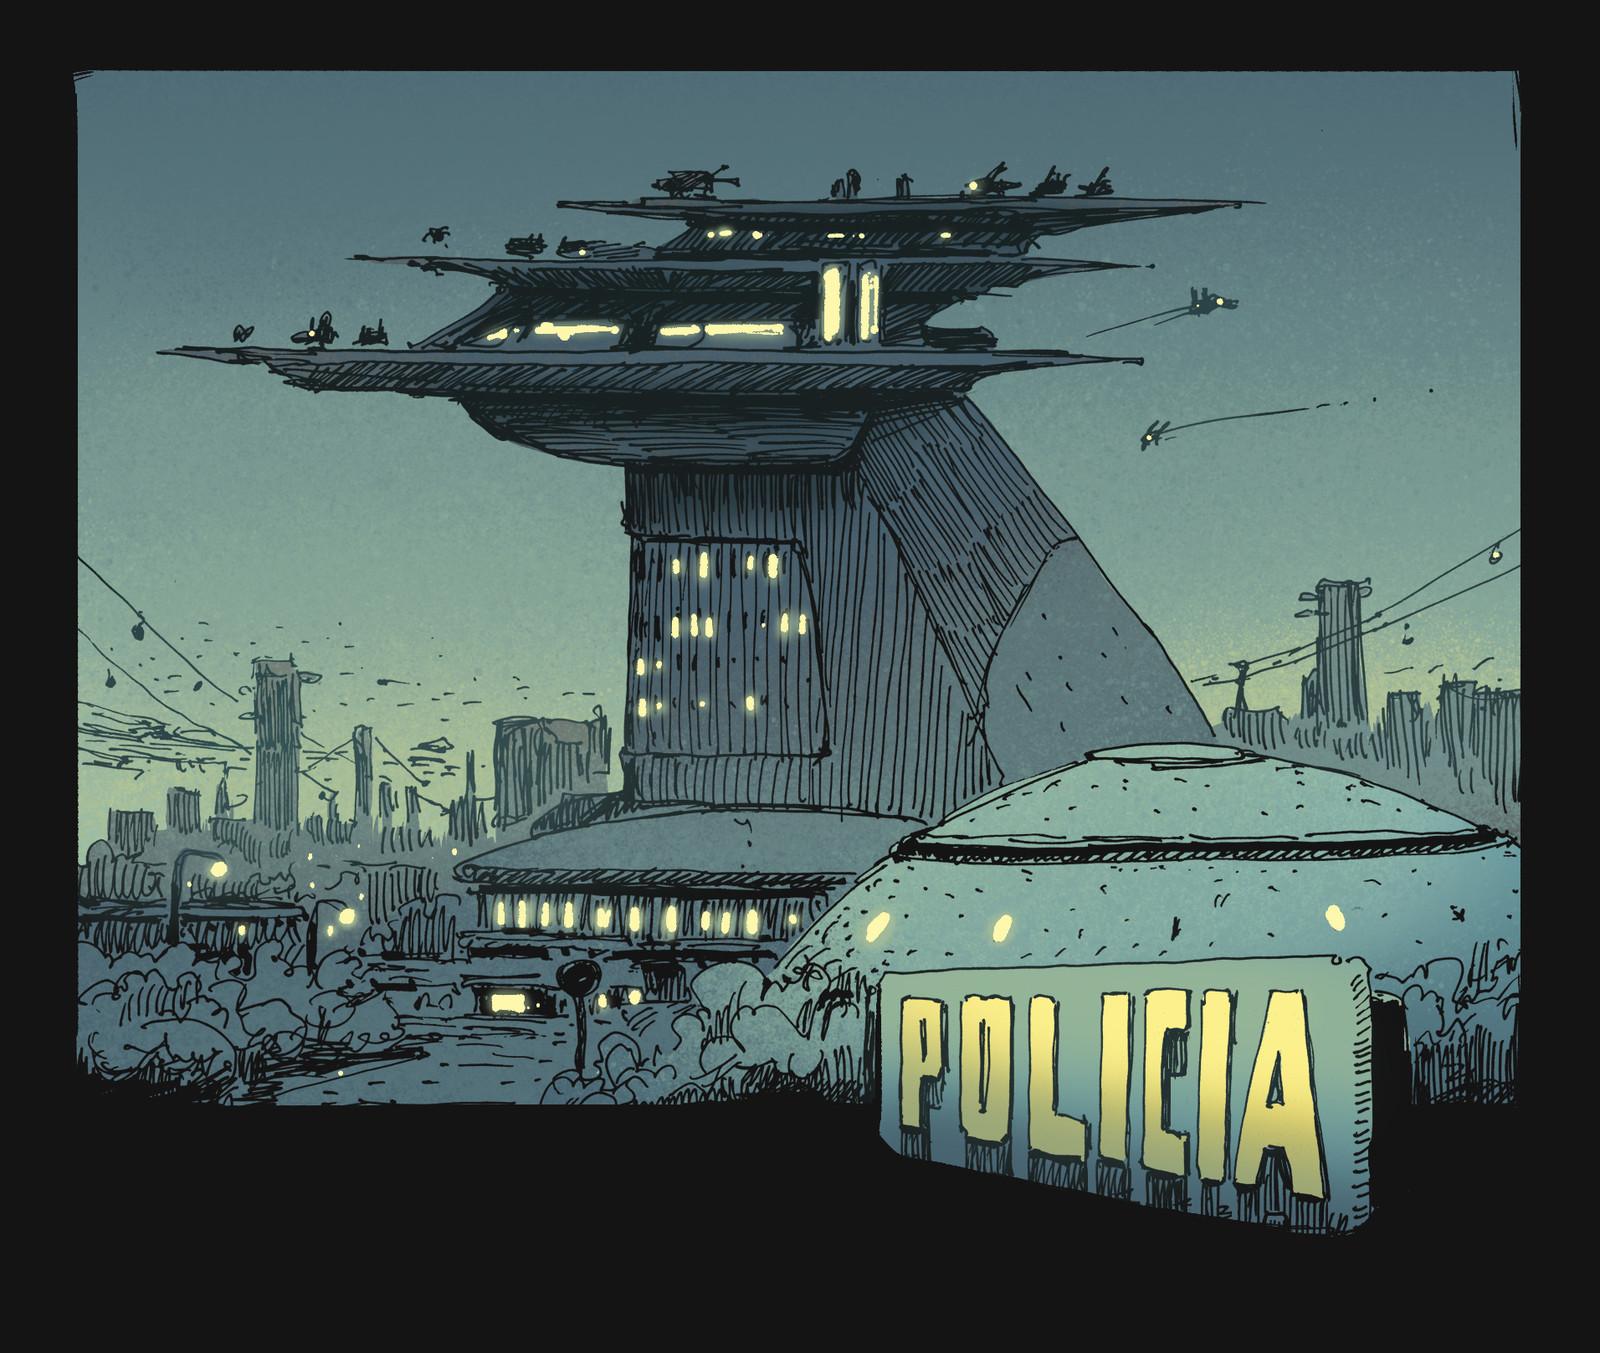 Police Station.